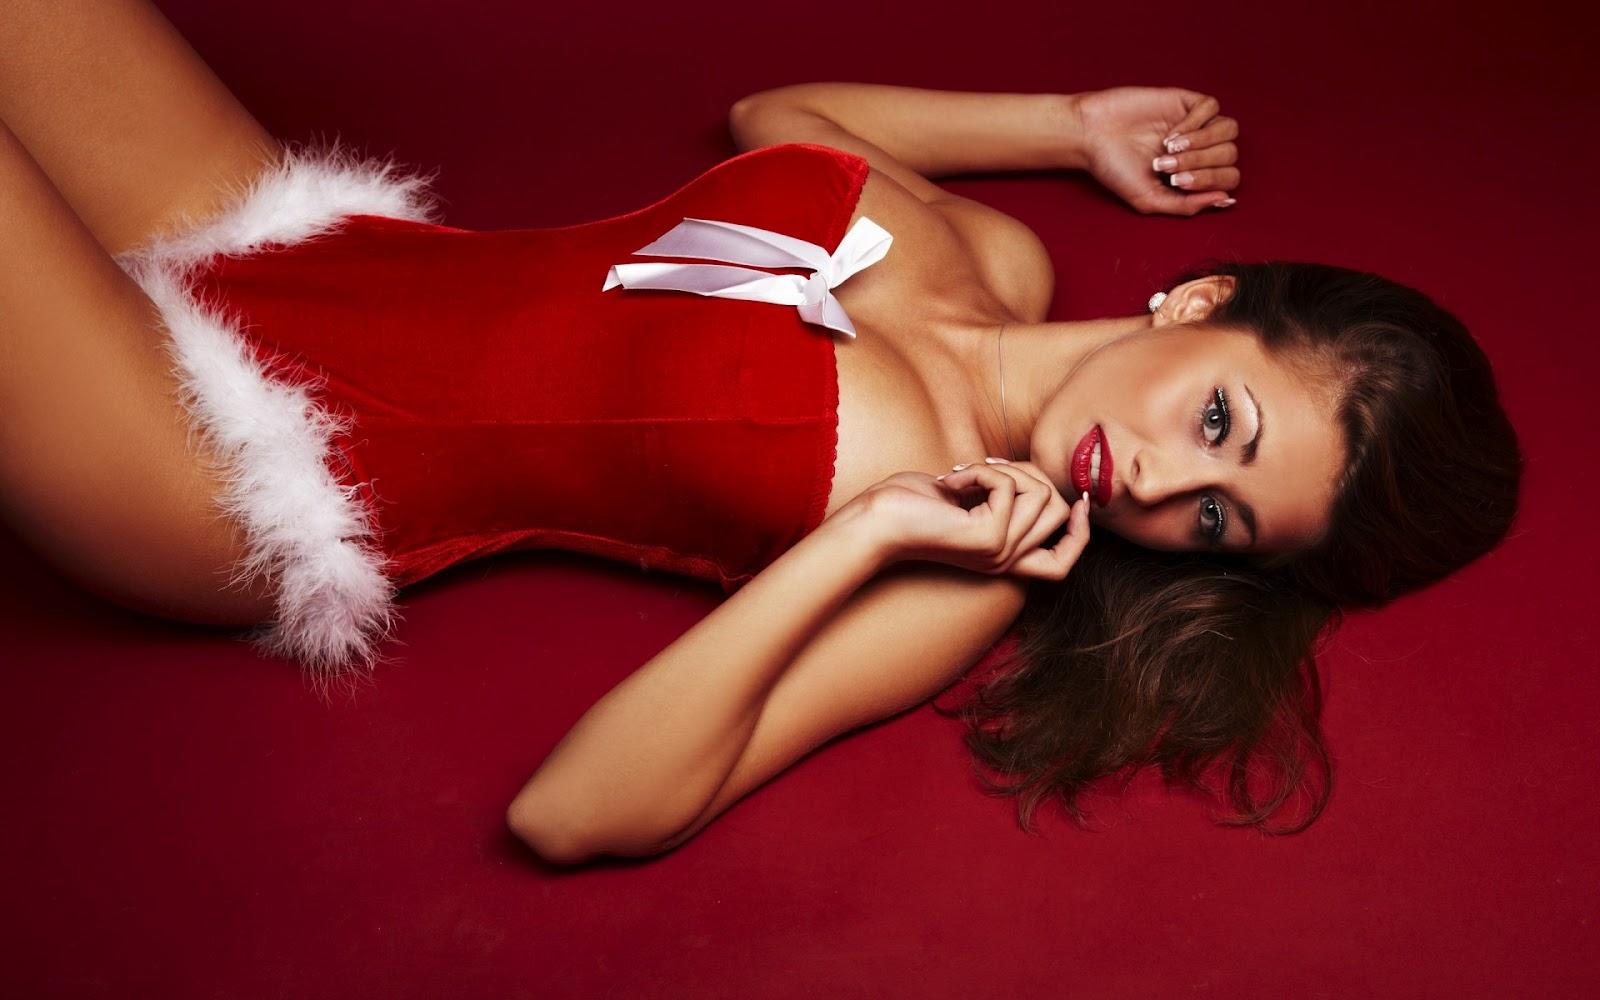 http://3.bp.blogspot.com/-iBnOQBL8Jc0/UBvtQDYBYJI/AAAAAAAAJvM/7KaN95_cnko/s1600/a-at-christmas.jpg